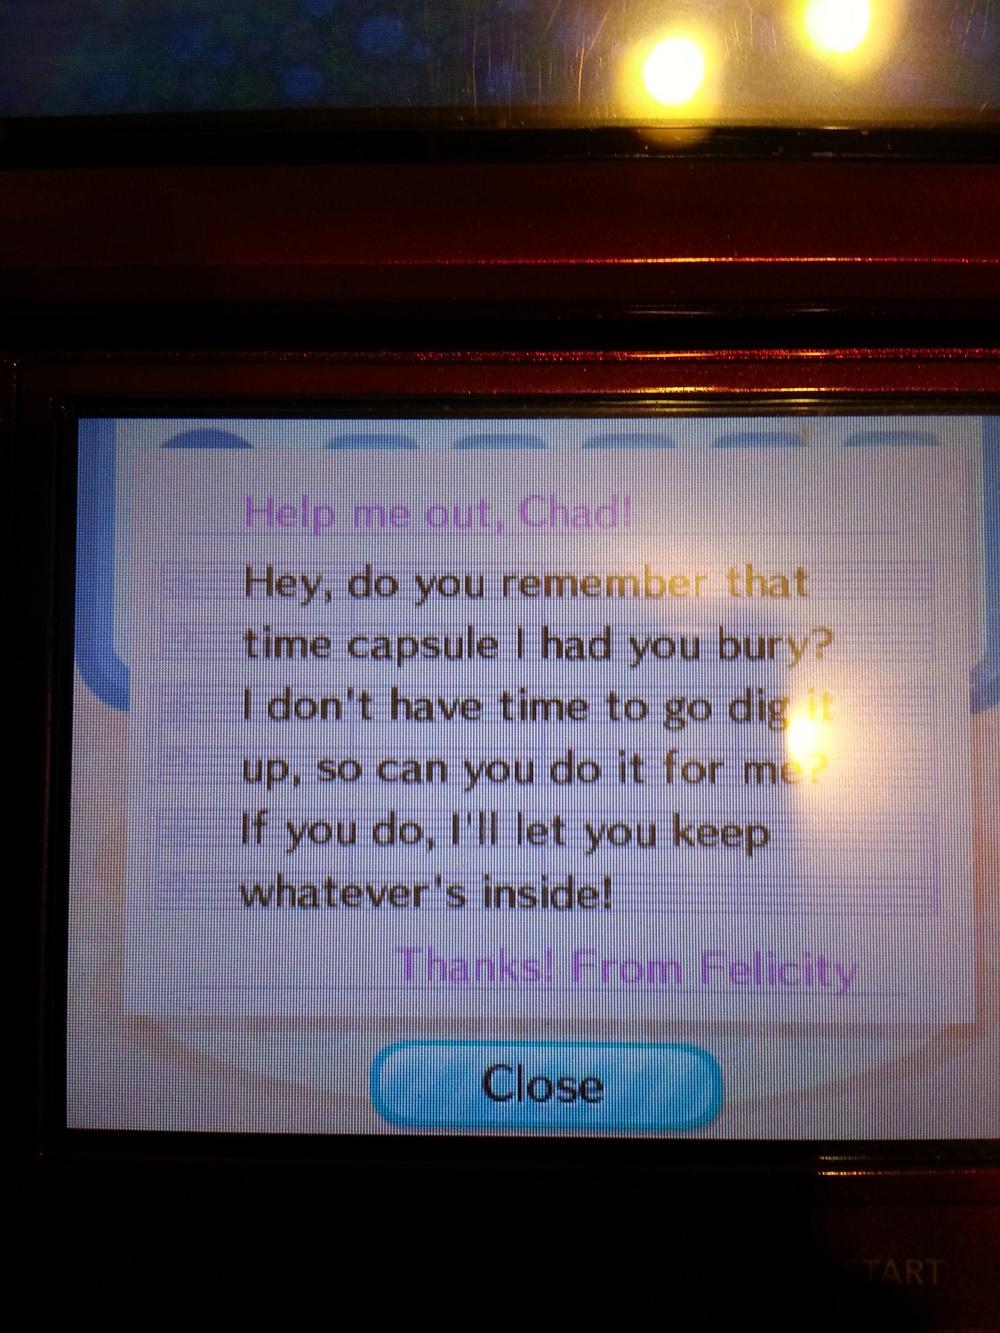 The letter Felicity sent to me. Man, I'm sad.